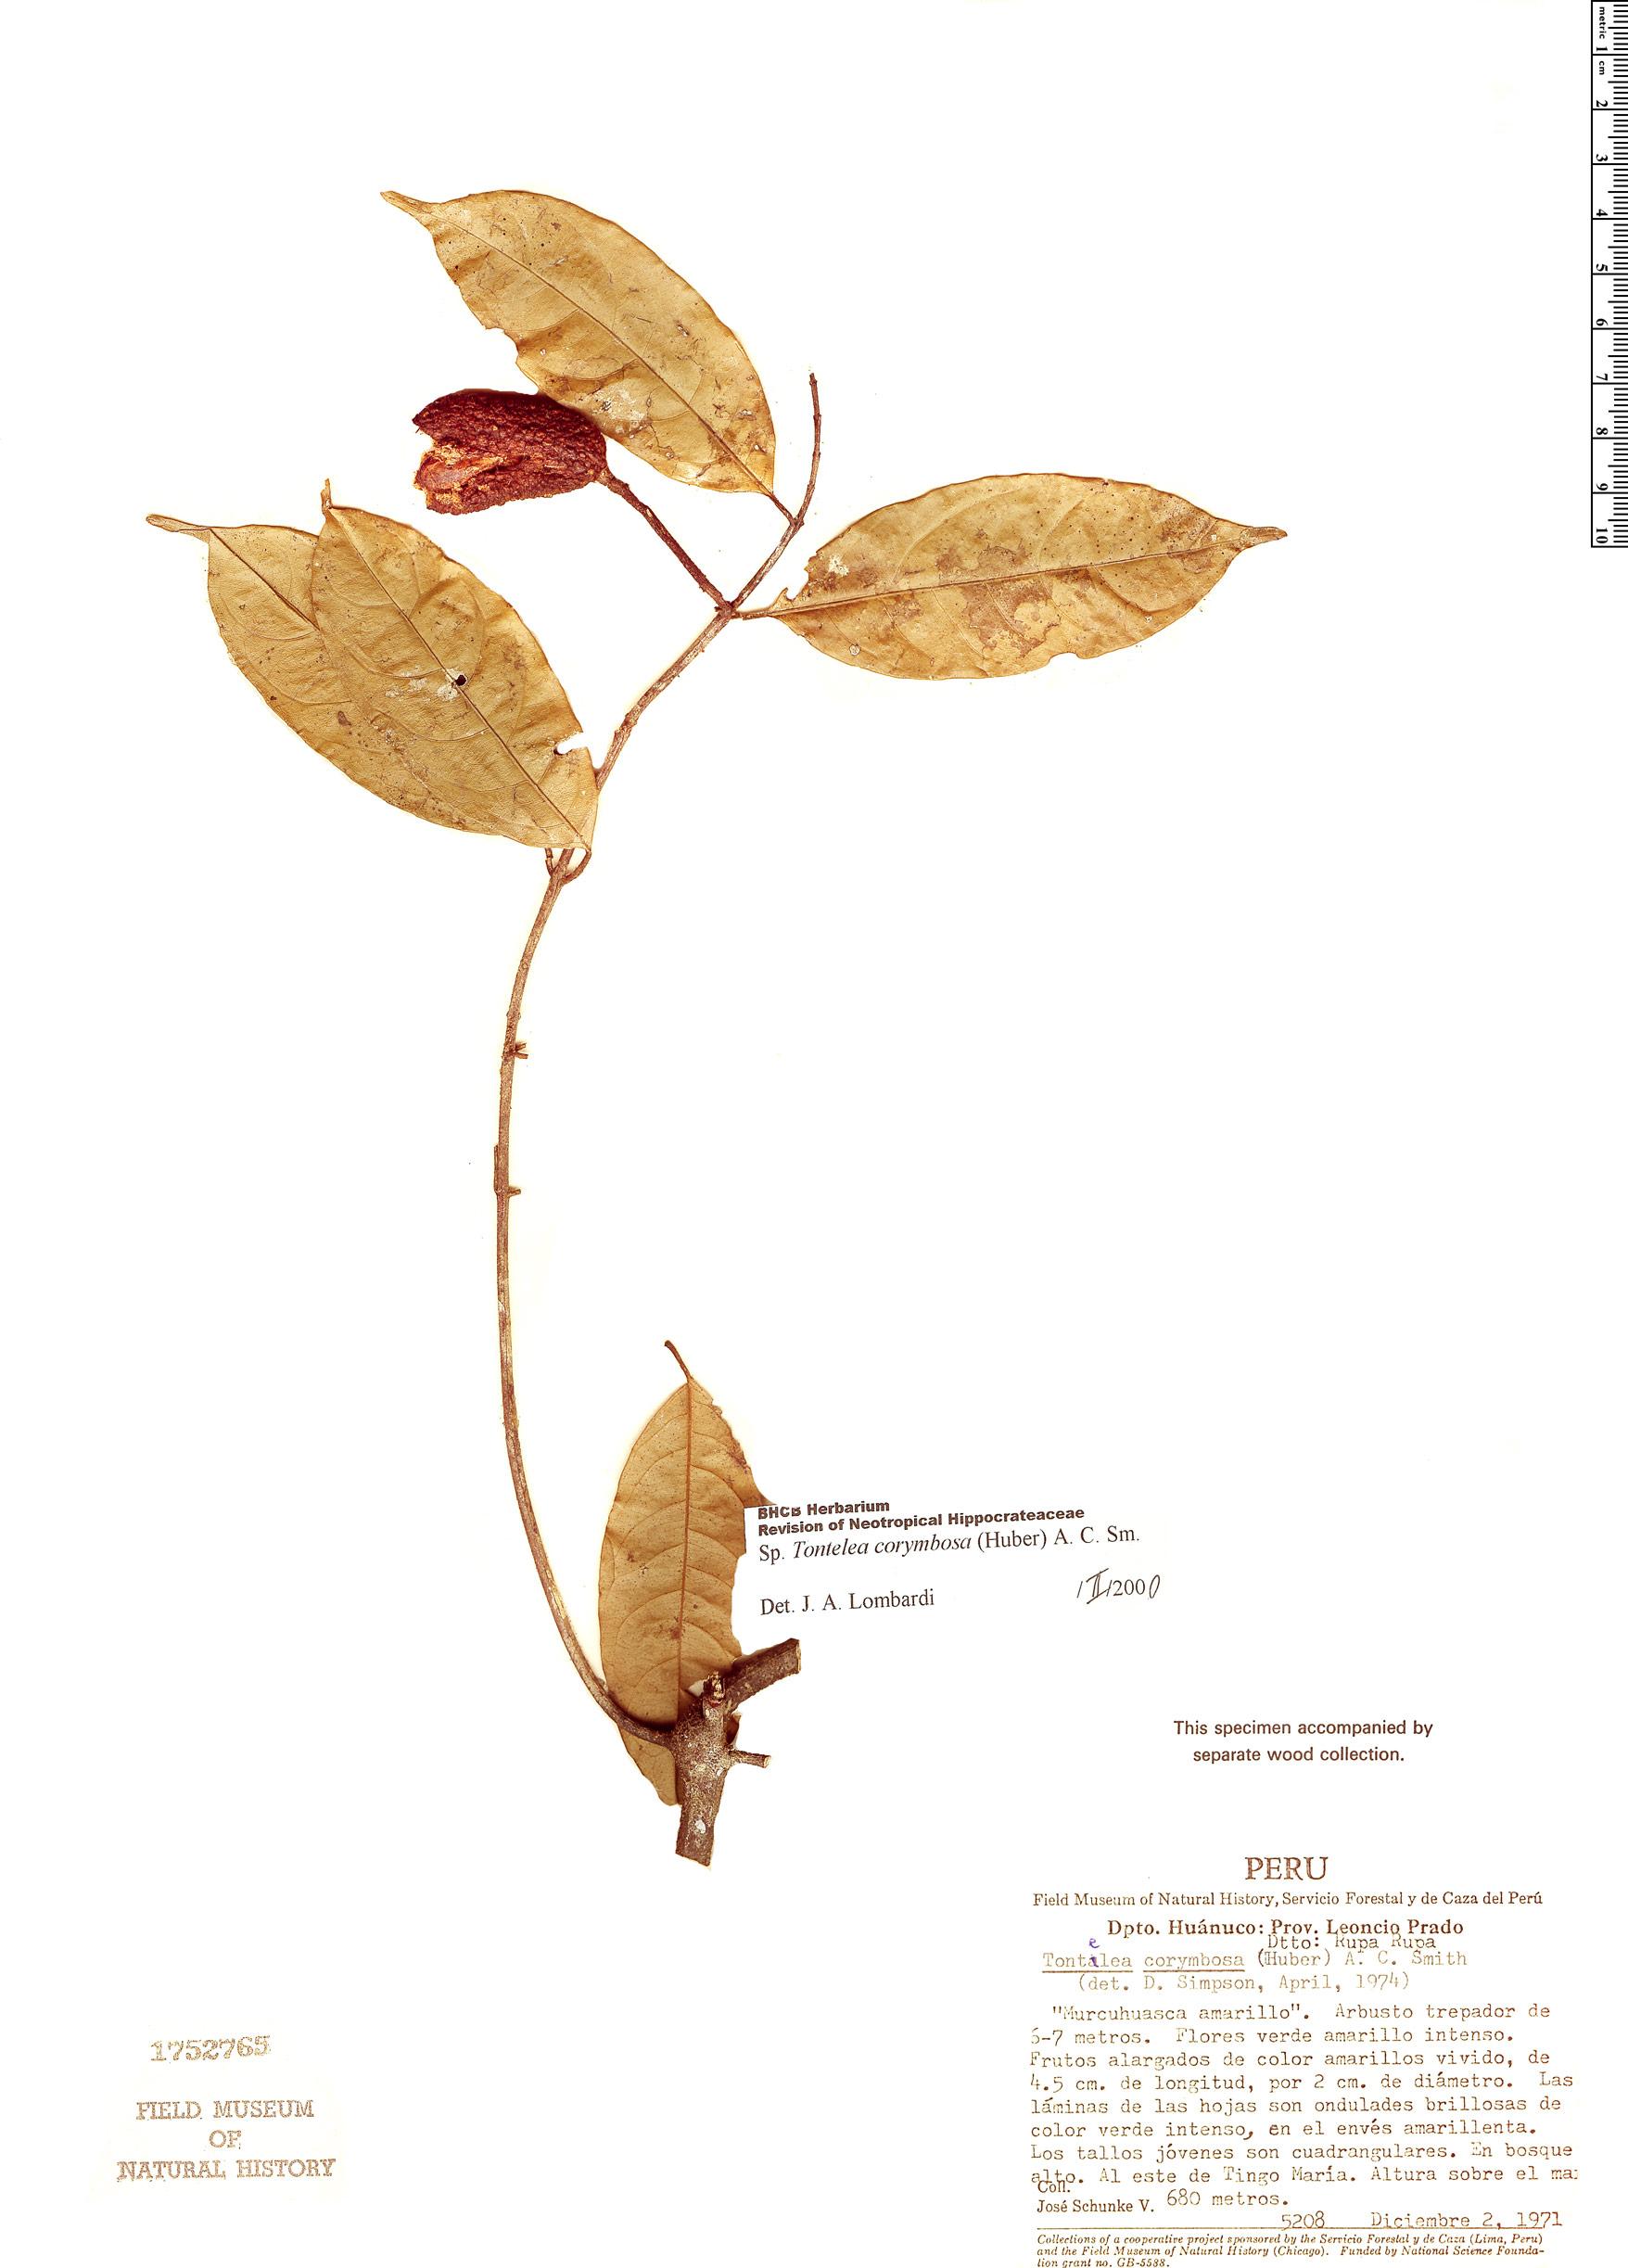 Specimen: Tontelea corymbosa